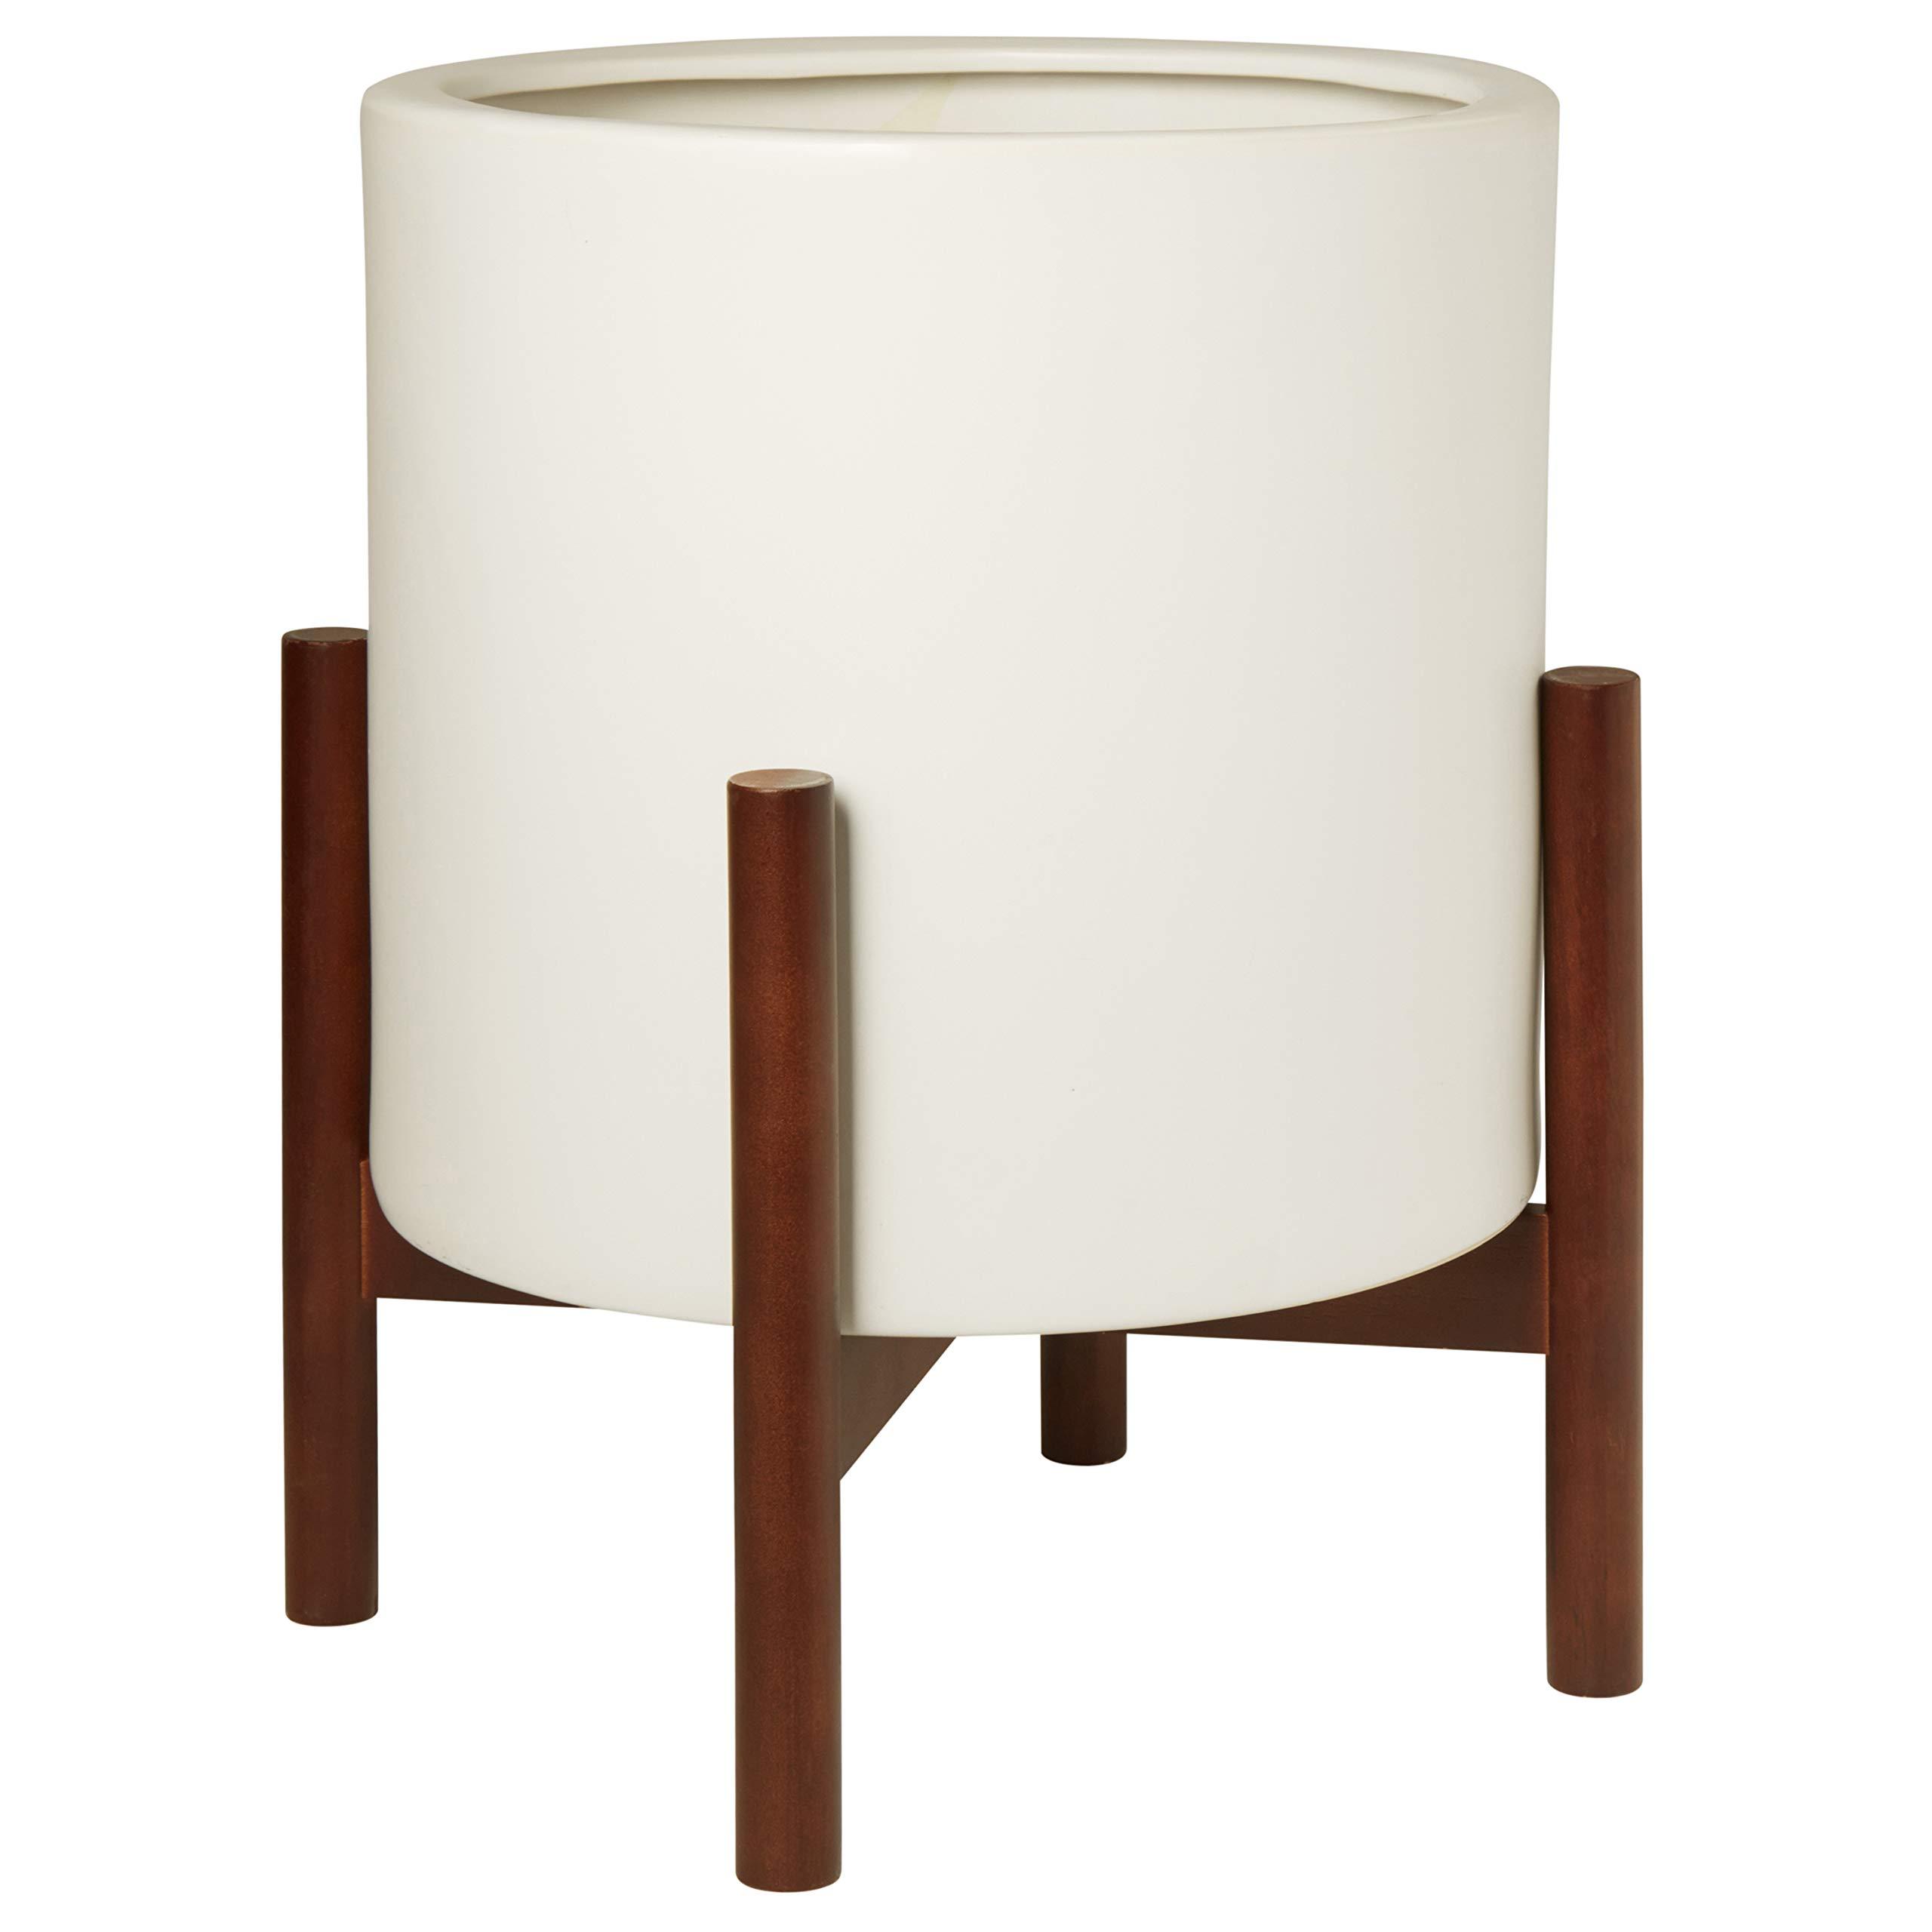 "Amazon Brand – Rivet Surrey Modern Ceramic Planter Pot with Wood Plant Stand, 19.75""H, White"